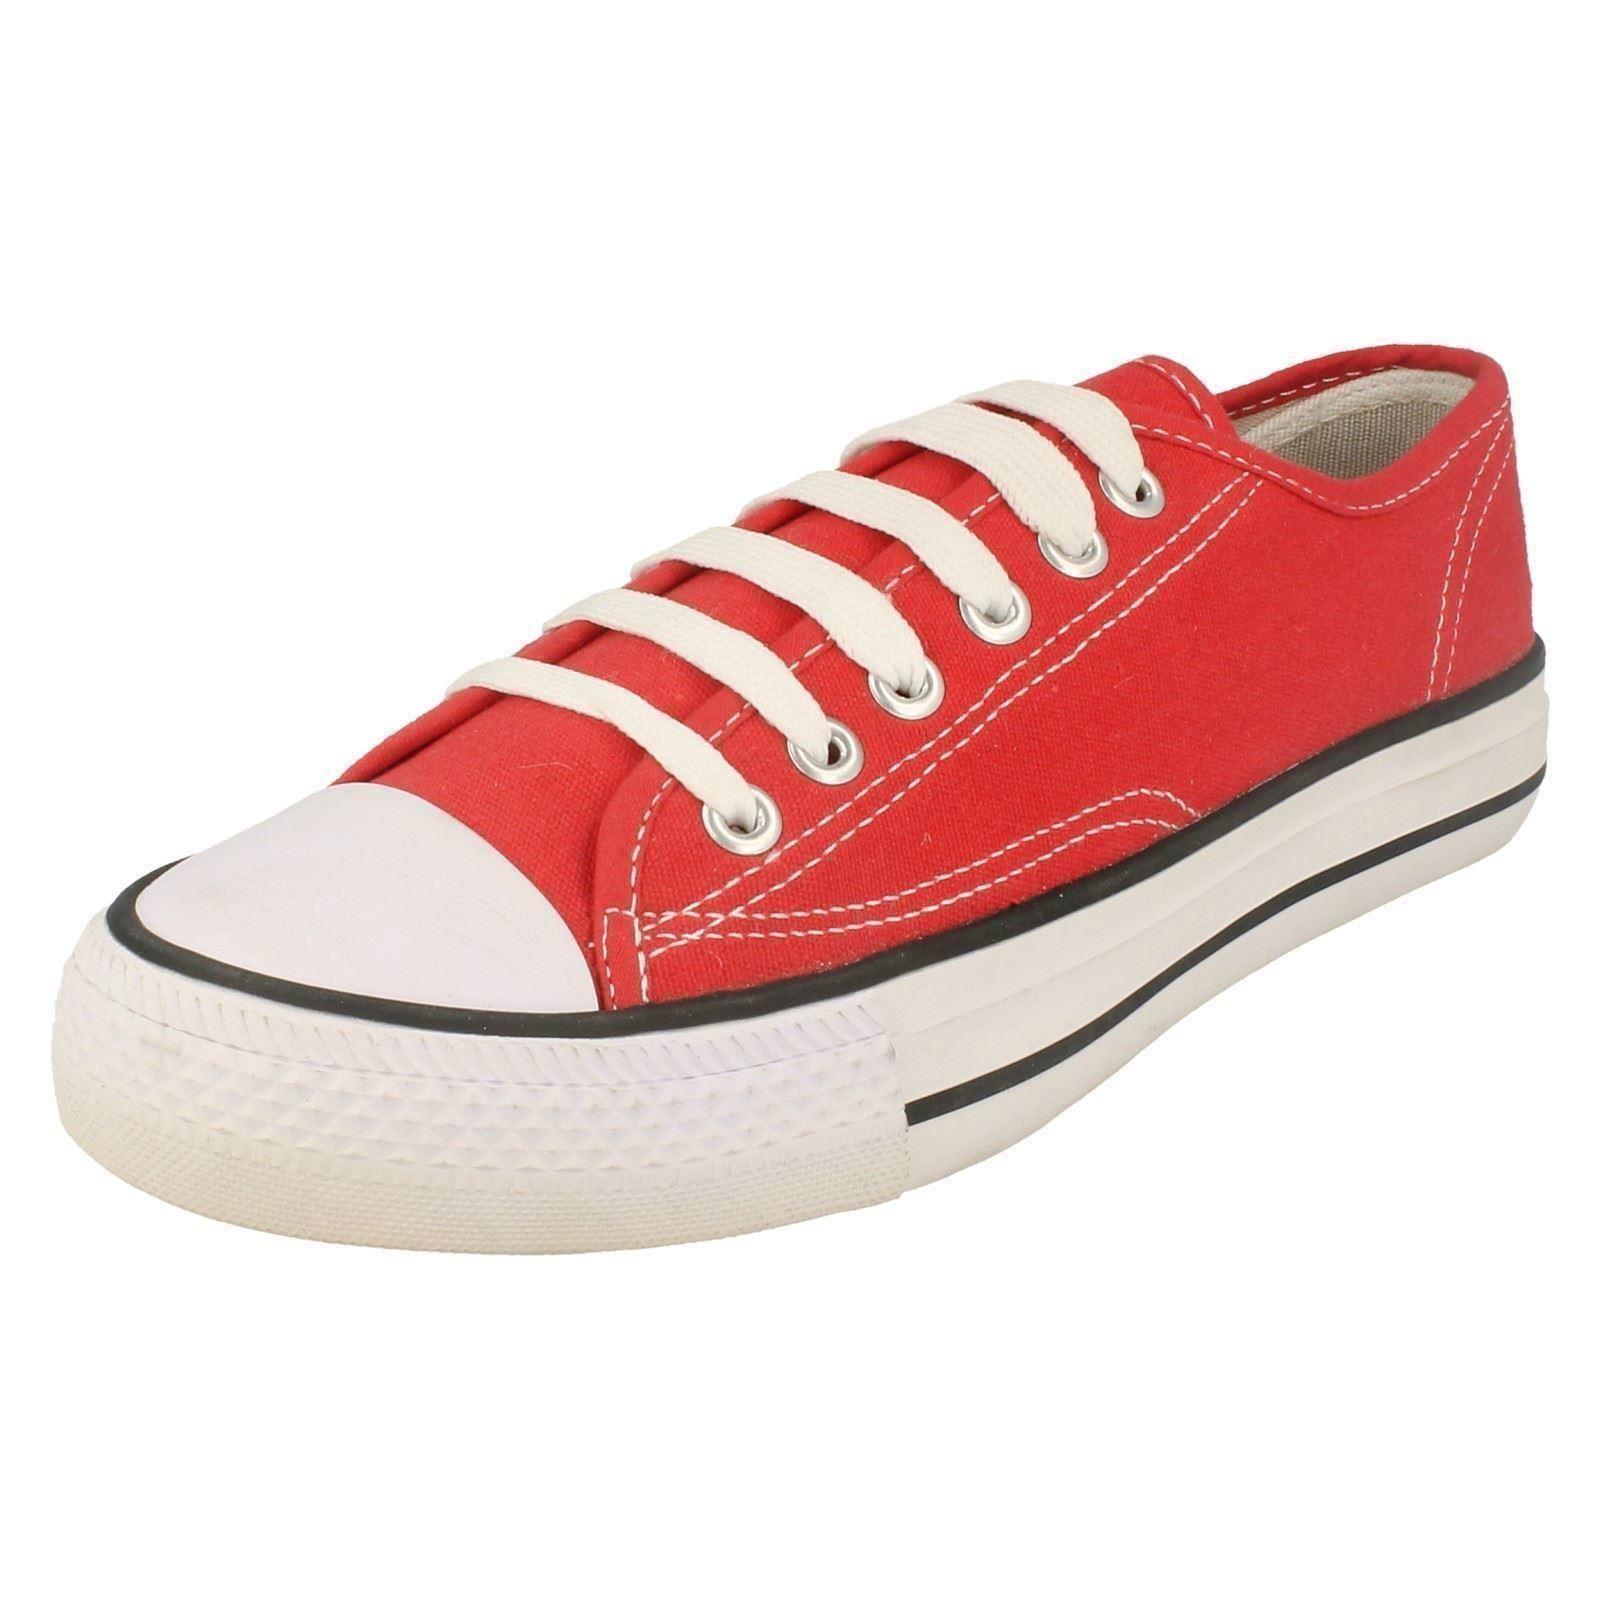 Childs punto en zapatos de lona X0001 Etiqueta ~ K